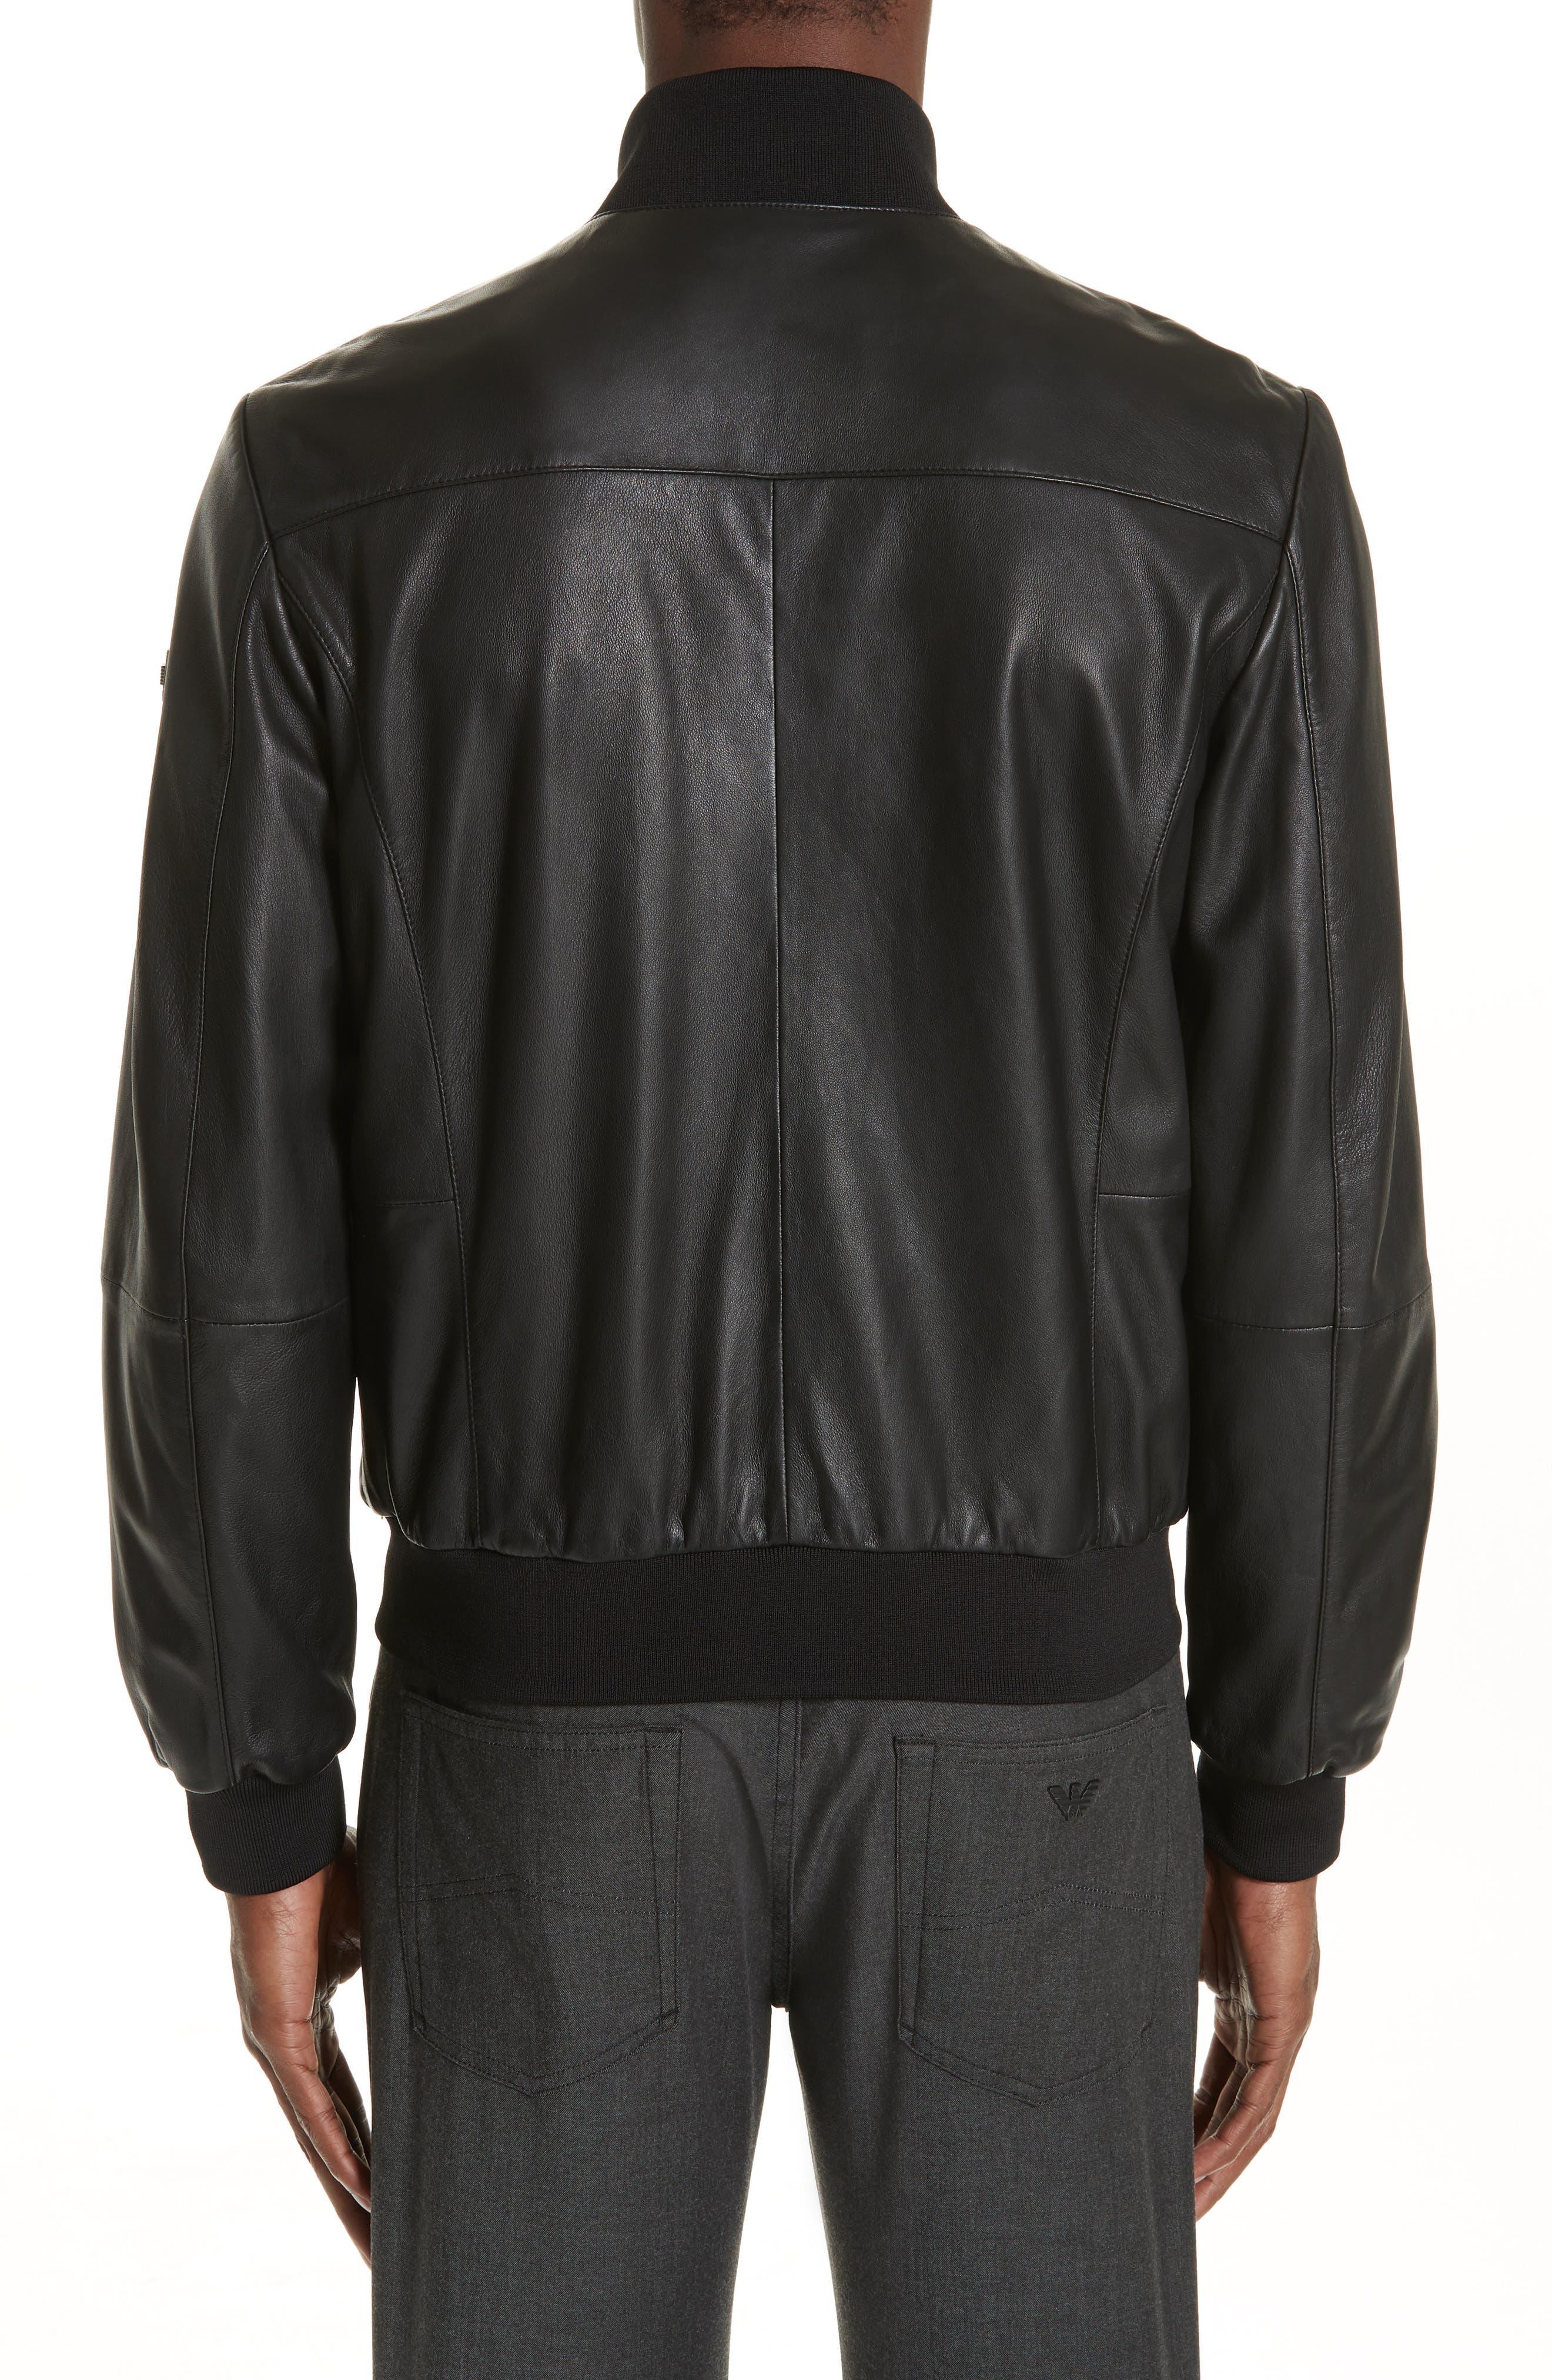 EMPORIO ARMANI, Leather Bomber Jacket, Alternate thumbnail 2, color, BLACK